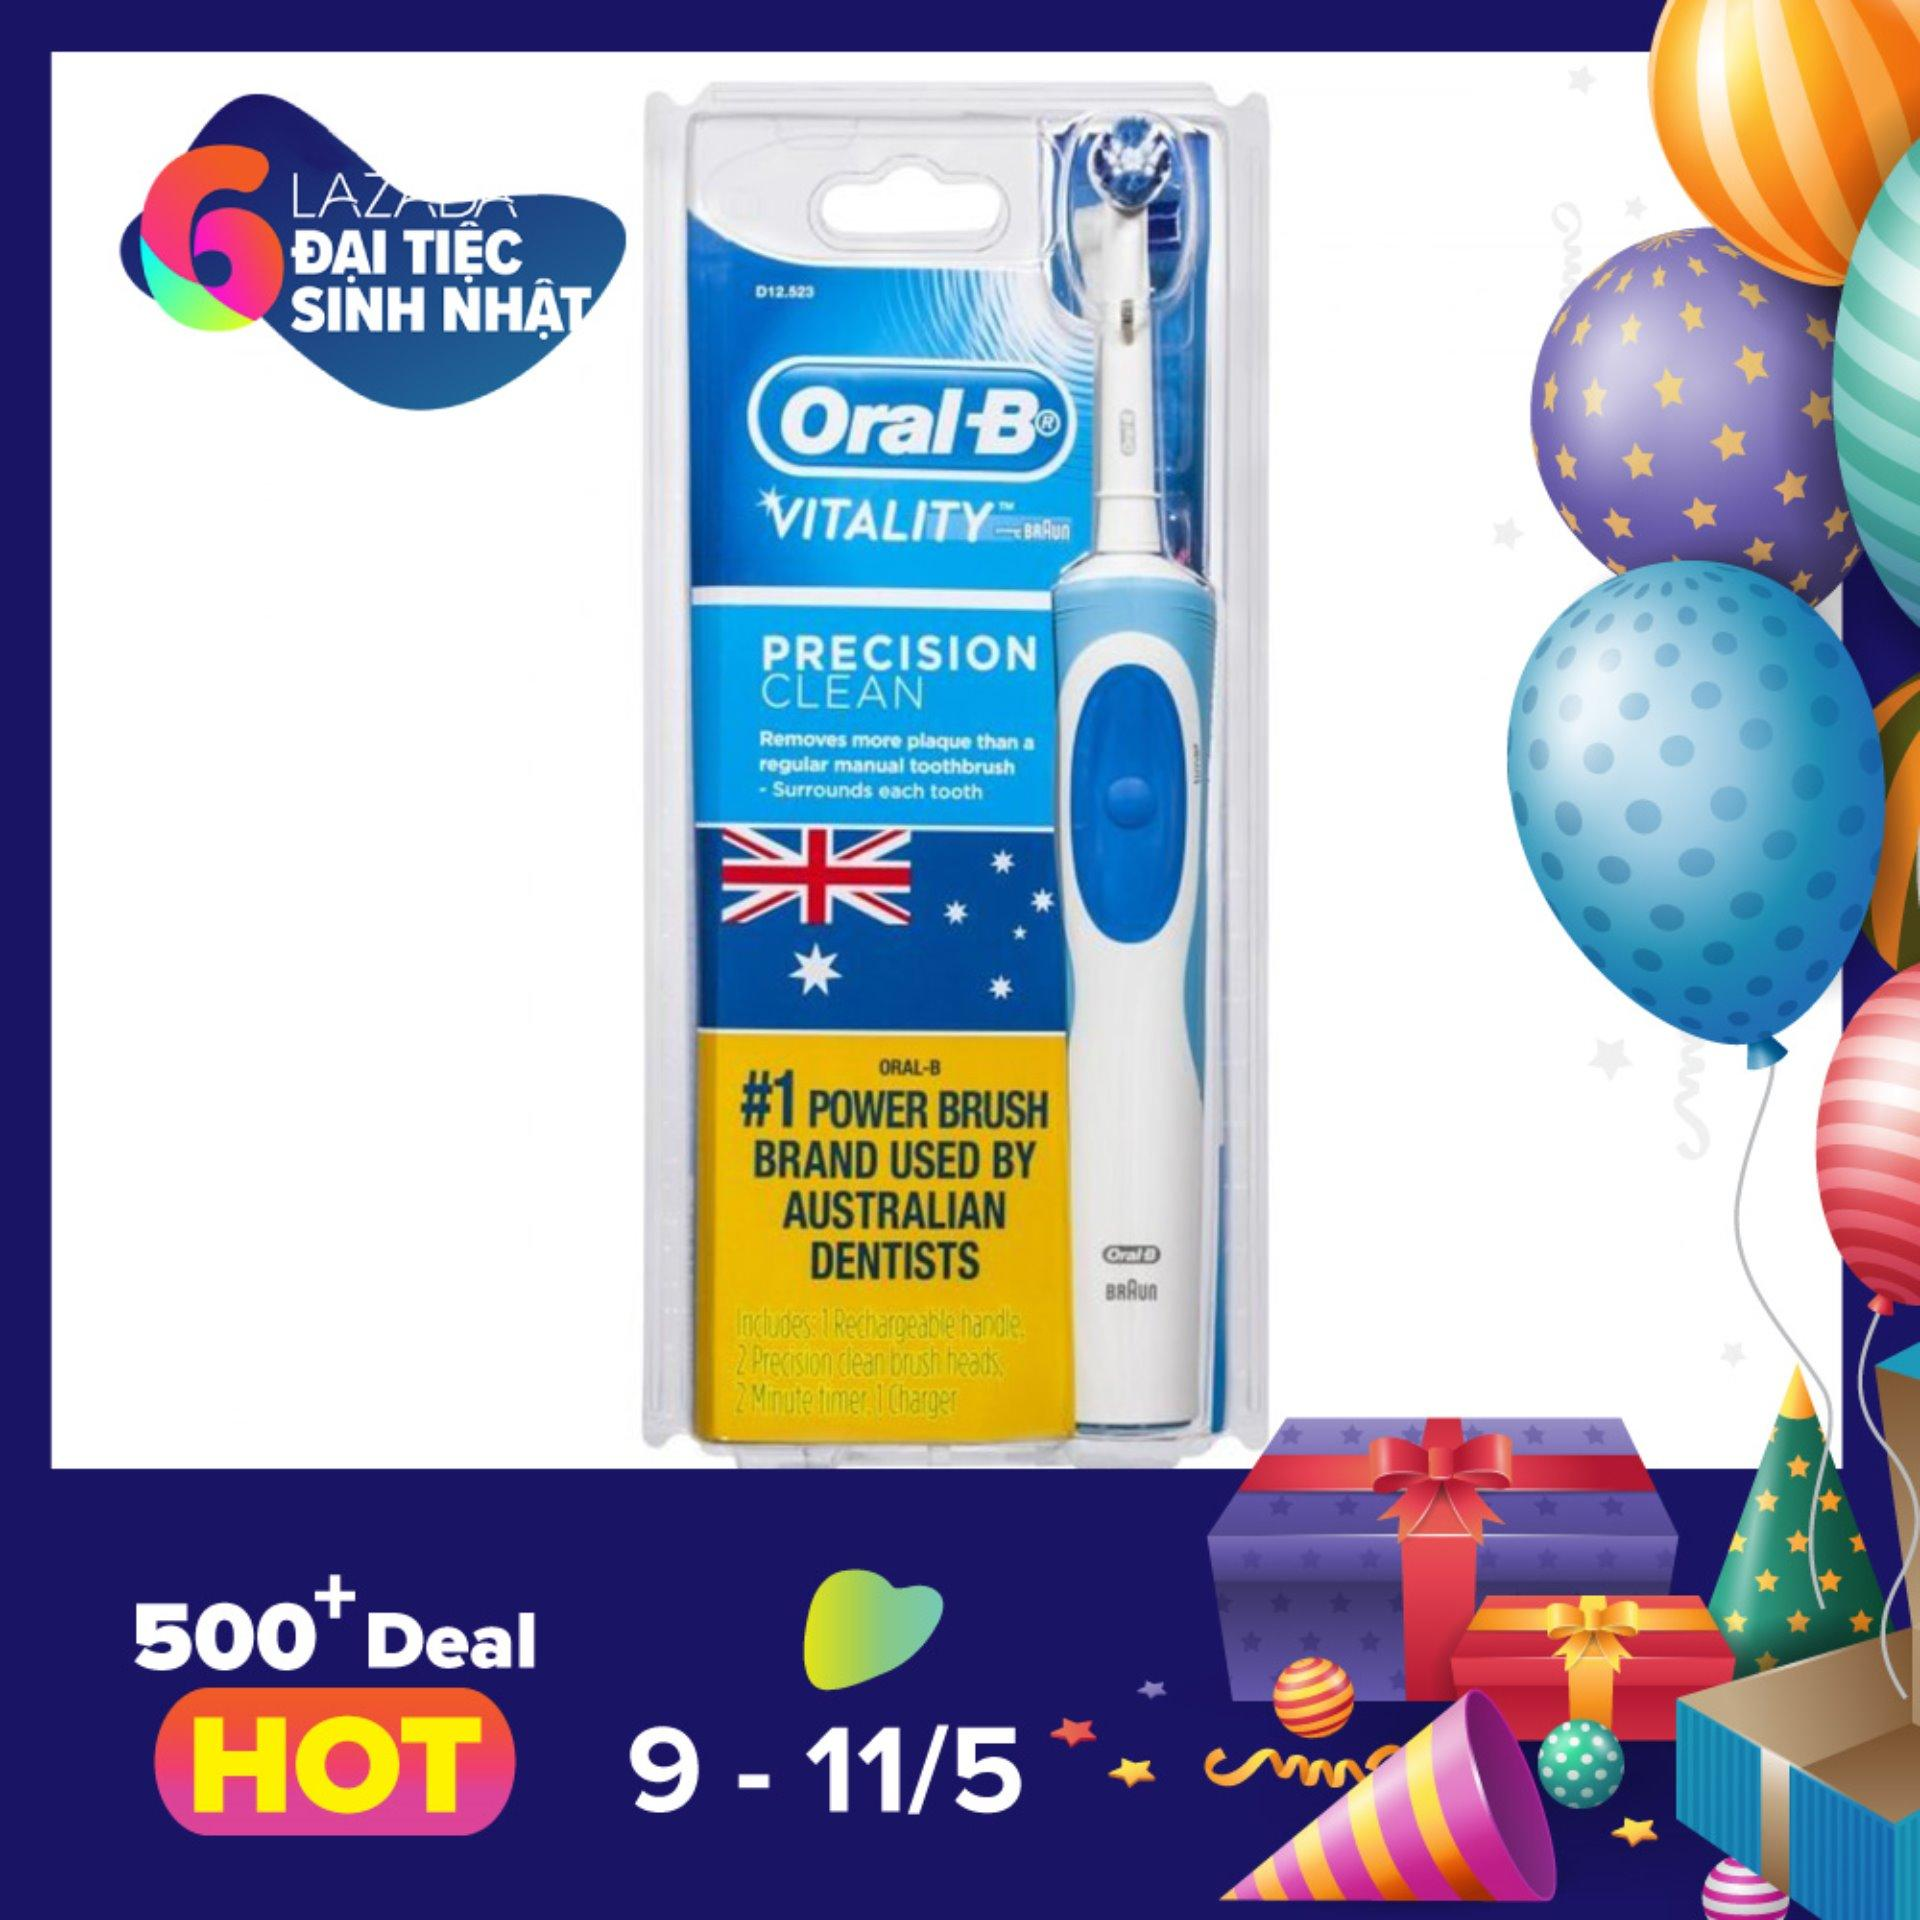 Bán Ban Chải Điện Oral B Vitality Precision Clean Uc Oral B Trực Tuyến